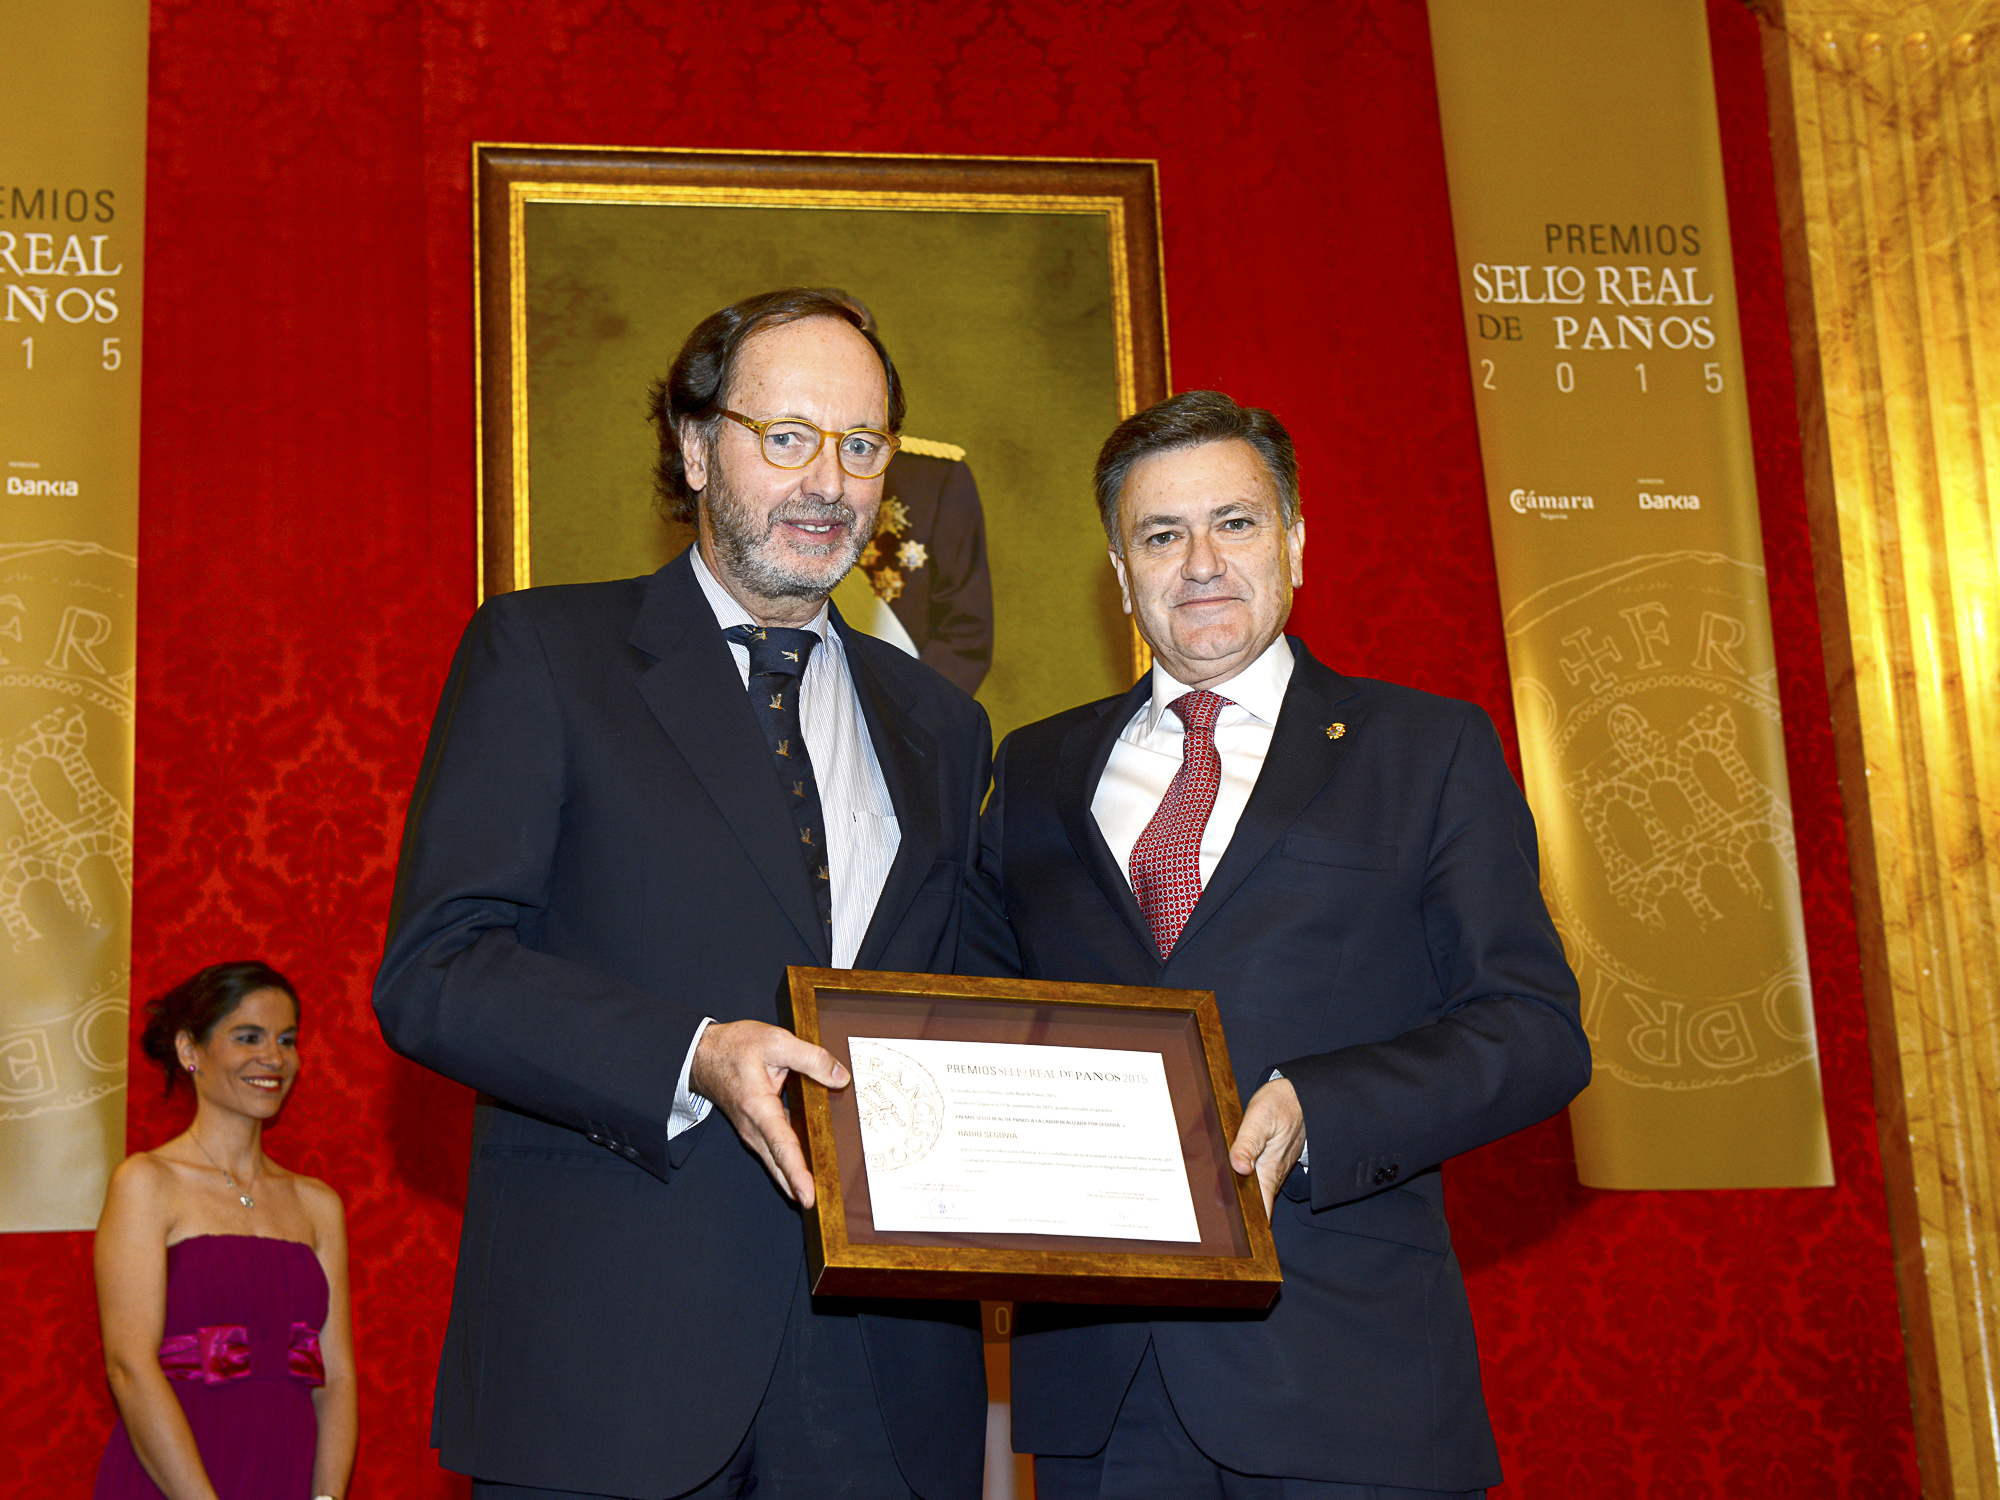 premios sello real de paños